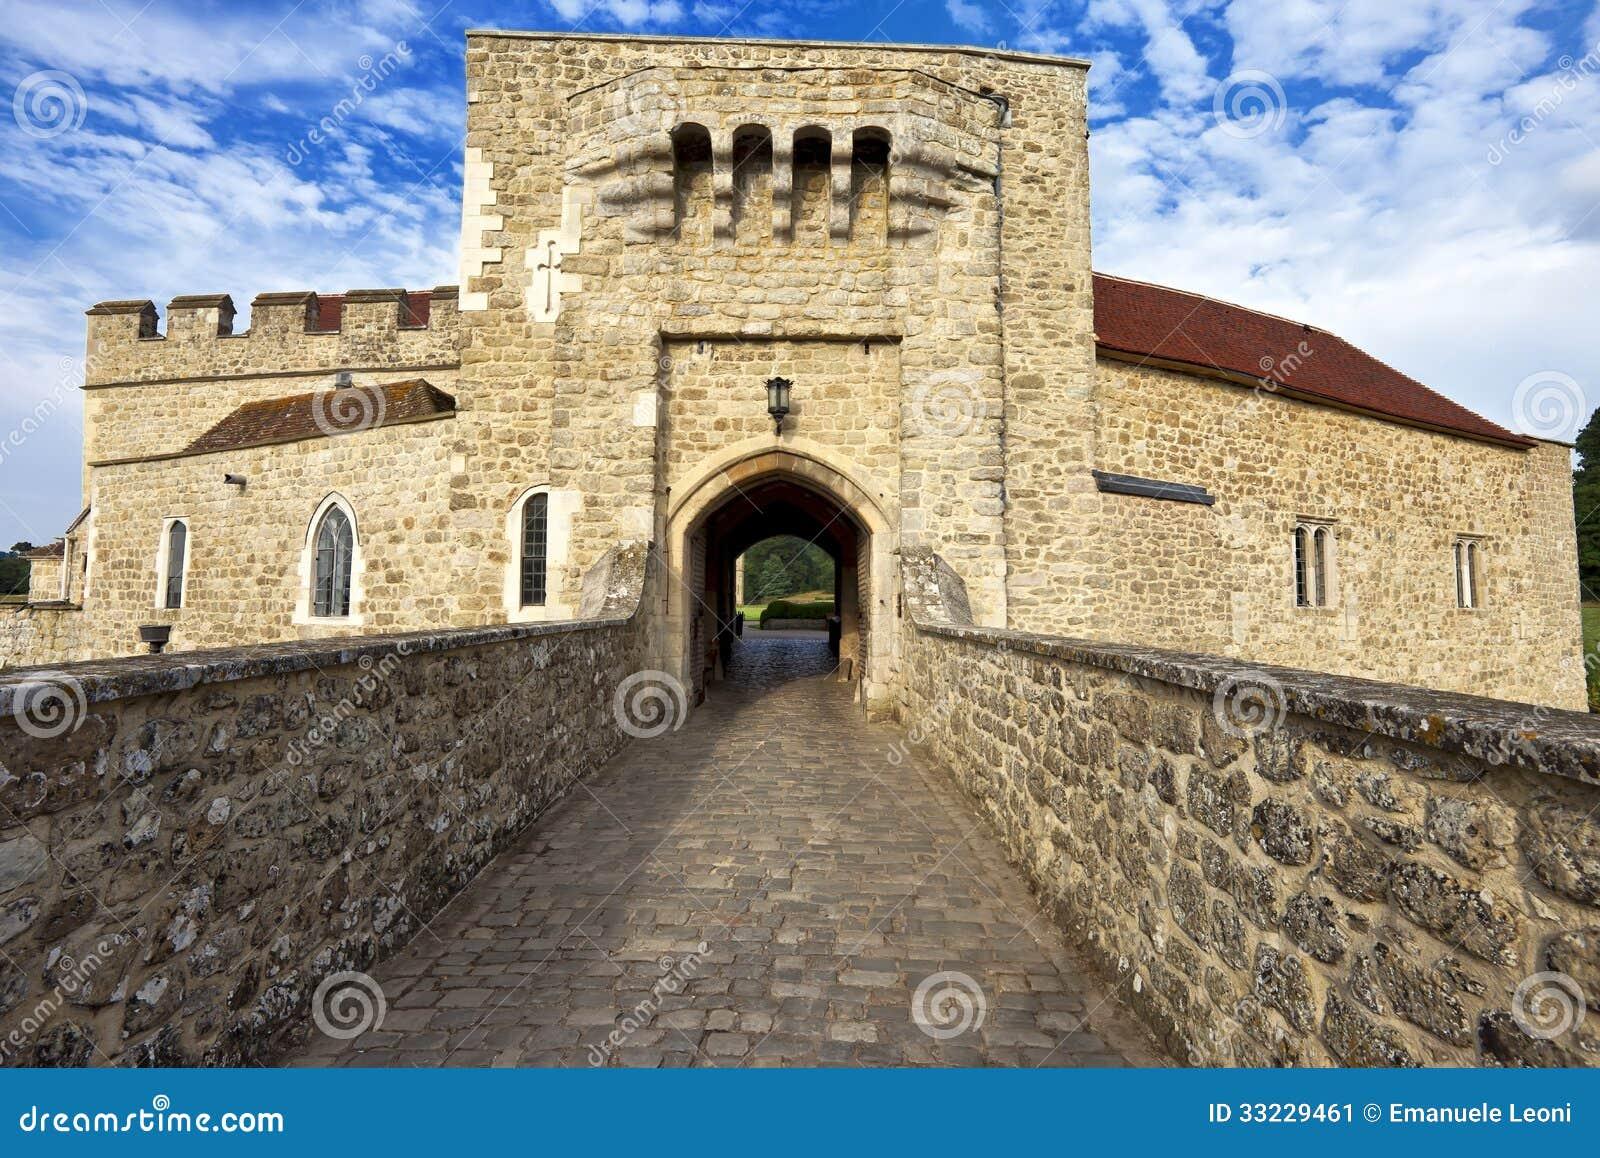 Leeds (AL) United States  City new picture : Leeds Castle Gate Entrance, Kent, United Kingdom Stock Image Image ...